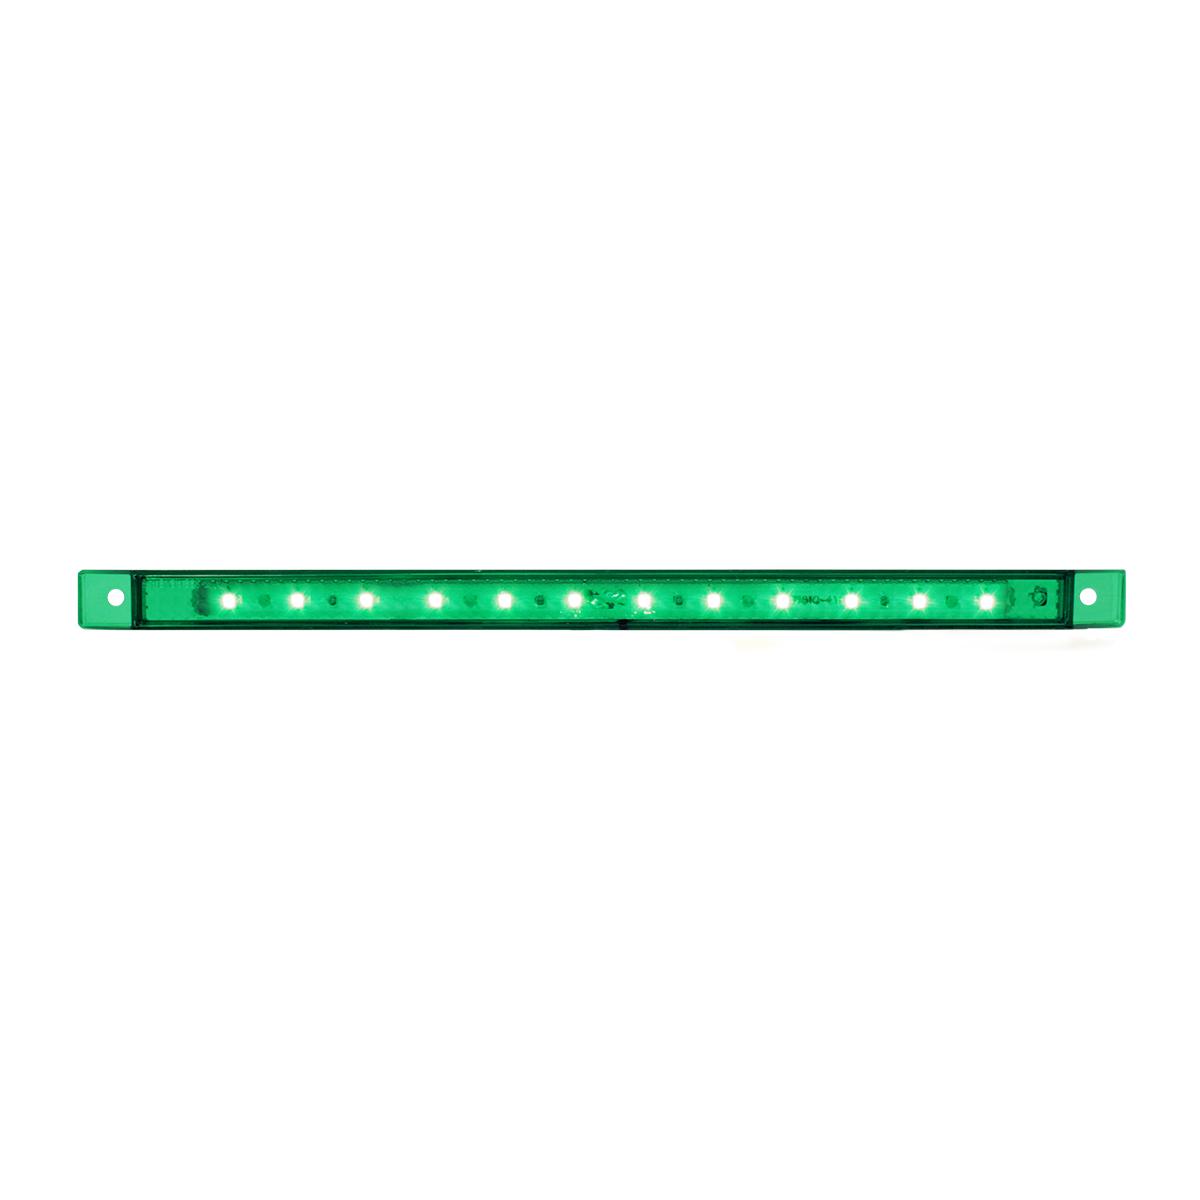 "75963 10-1/8"" Ultra Thin LED Marker Light"